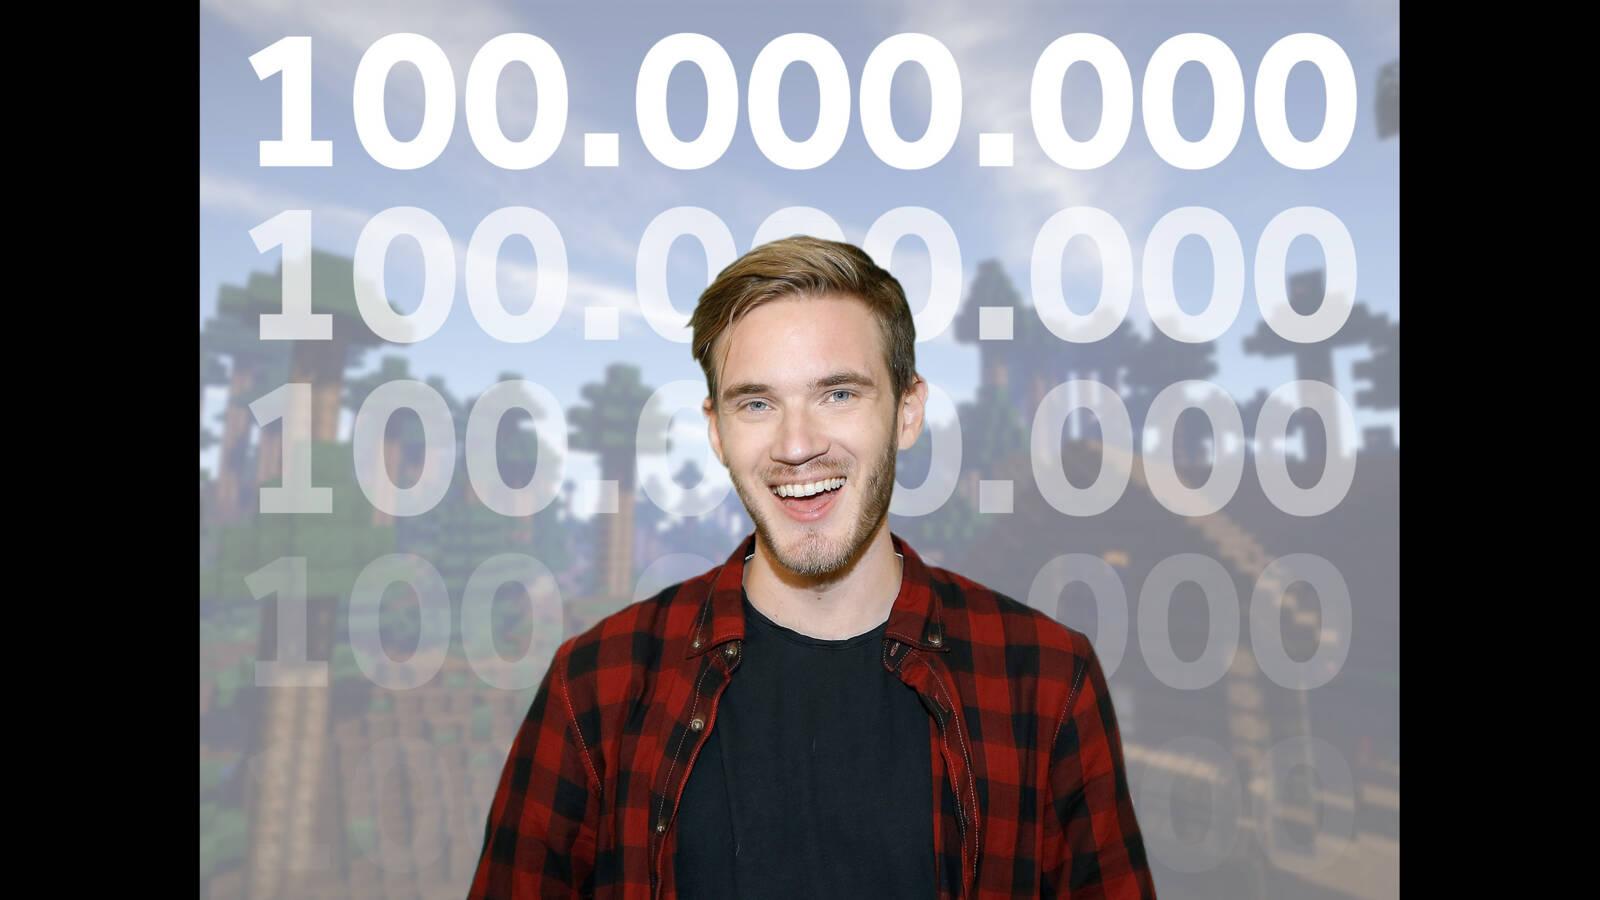 YouTuber PewDiePie is 'slim möde' en skeidet der med uut